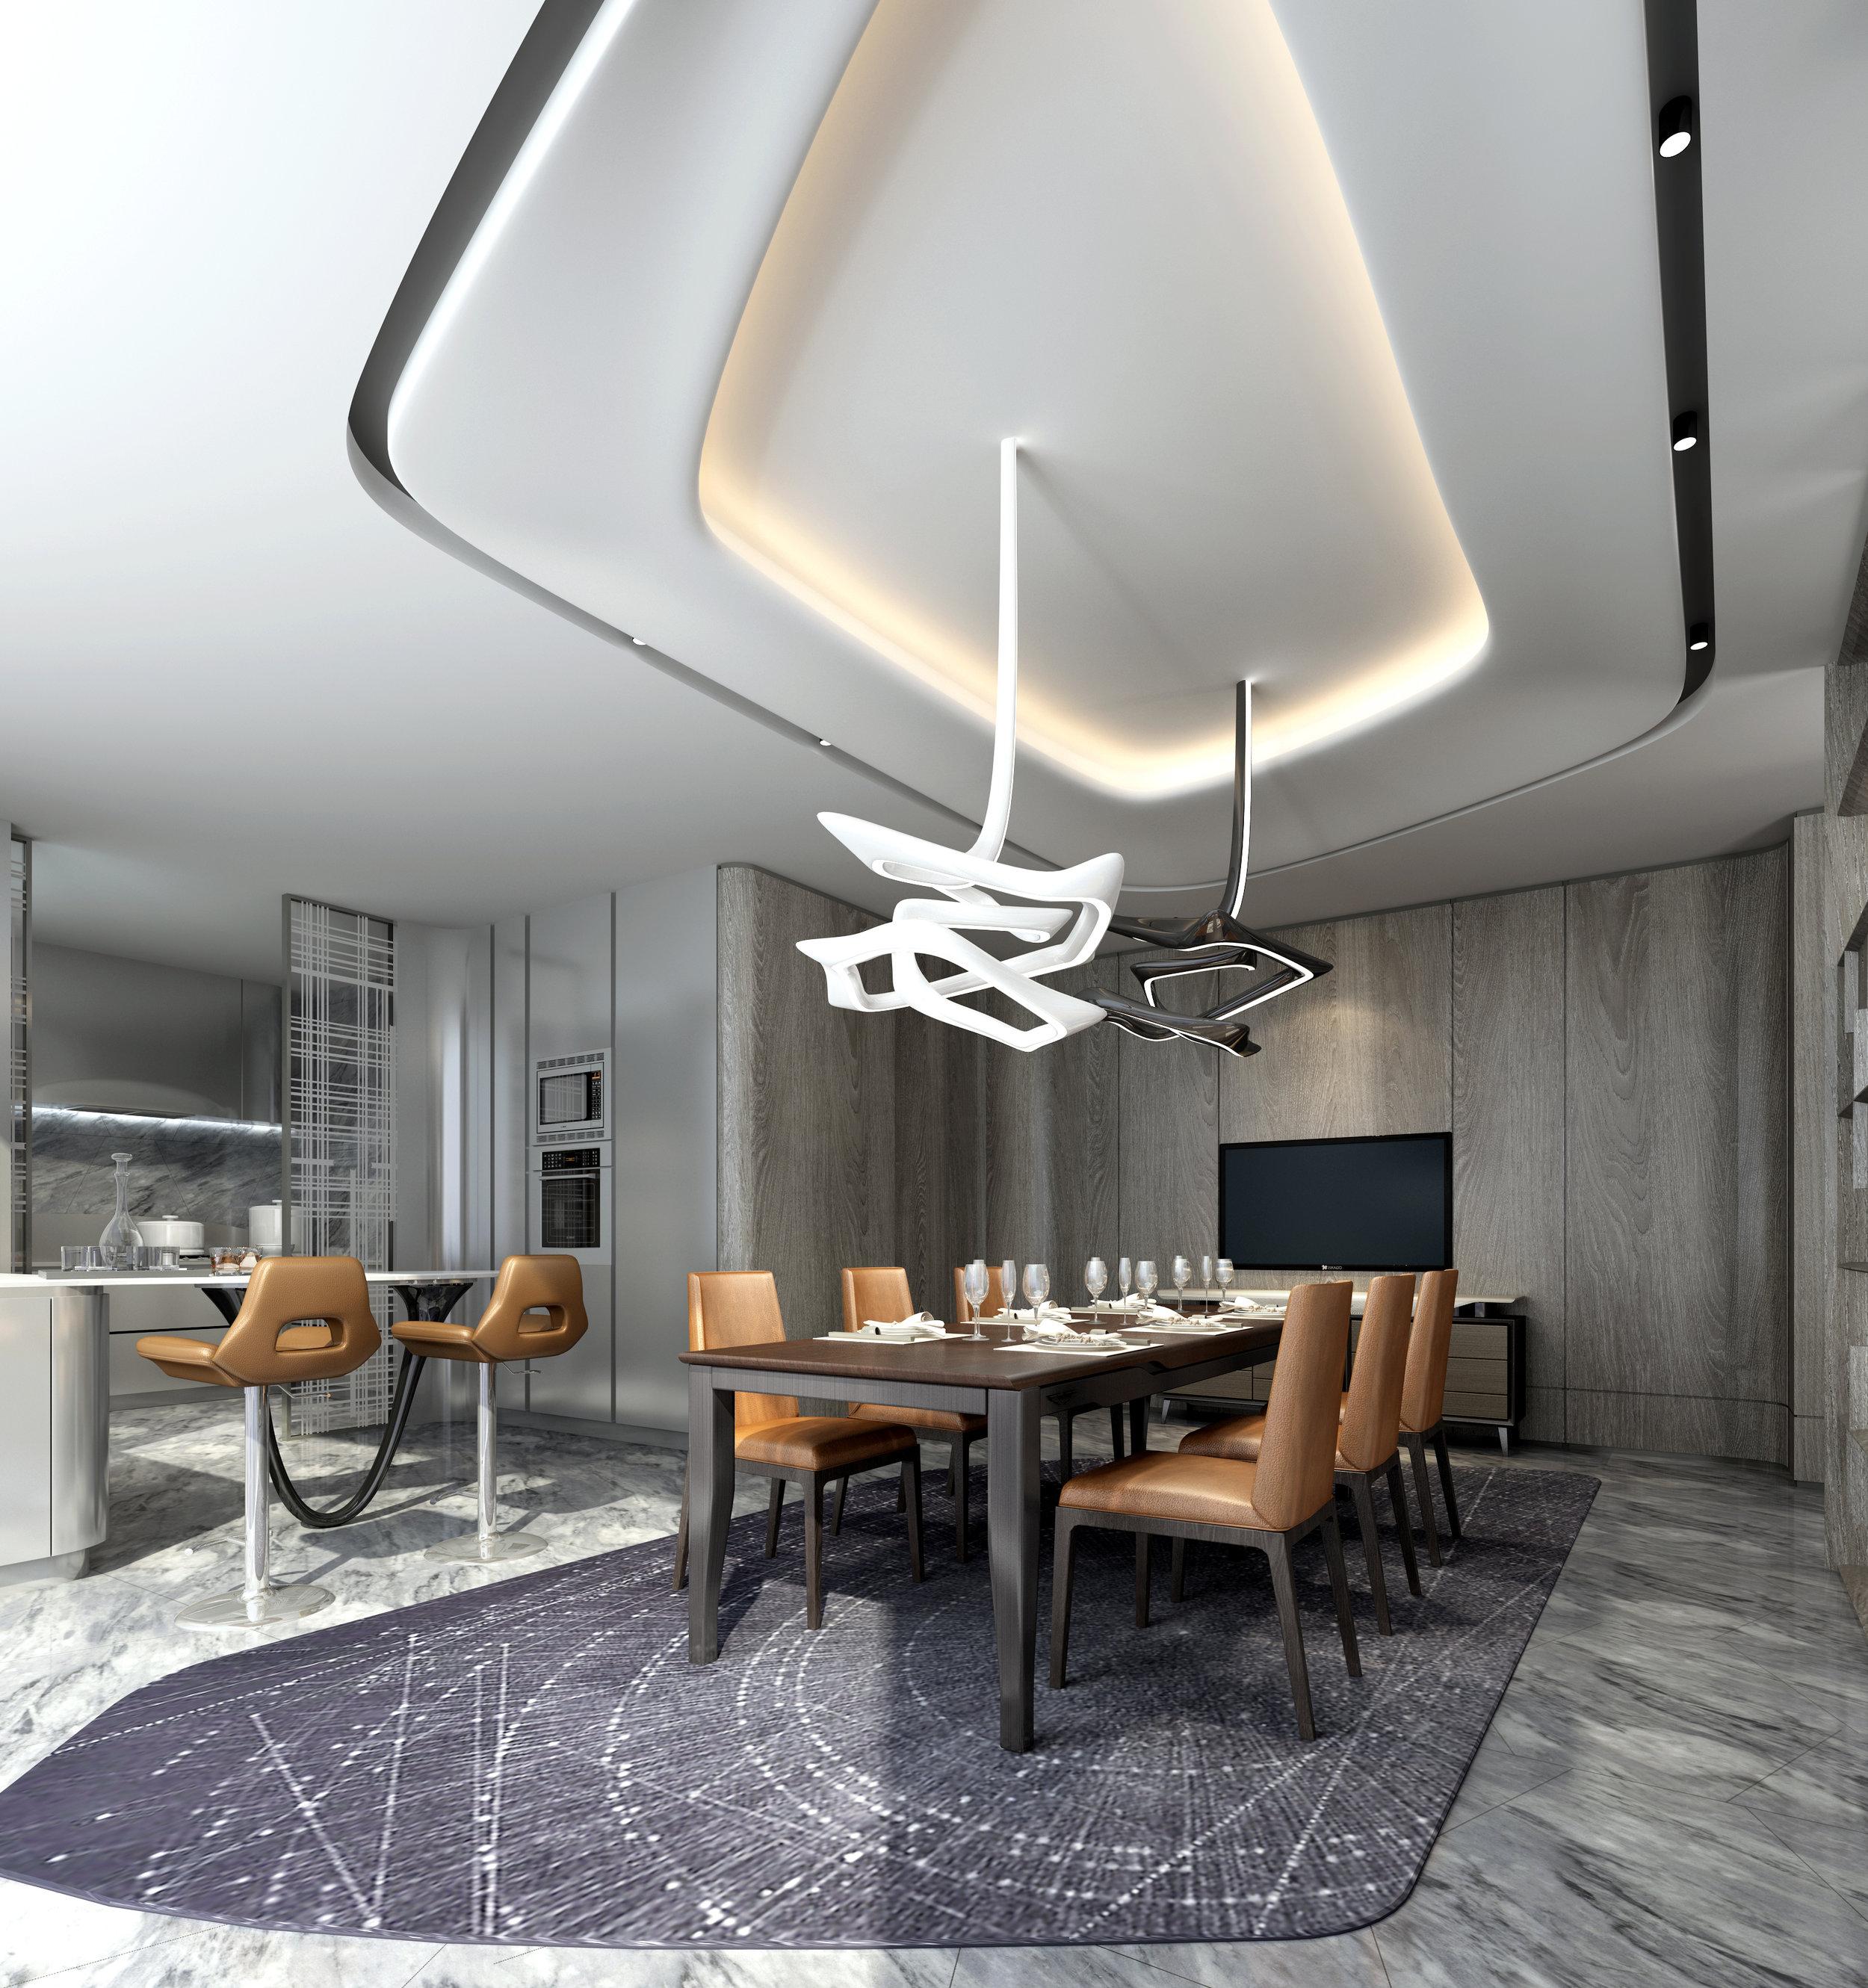 02 Aston Martin Restaurant.jpg